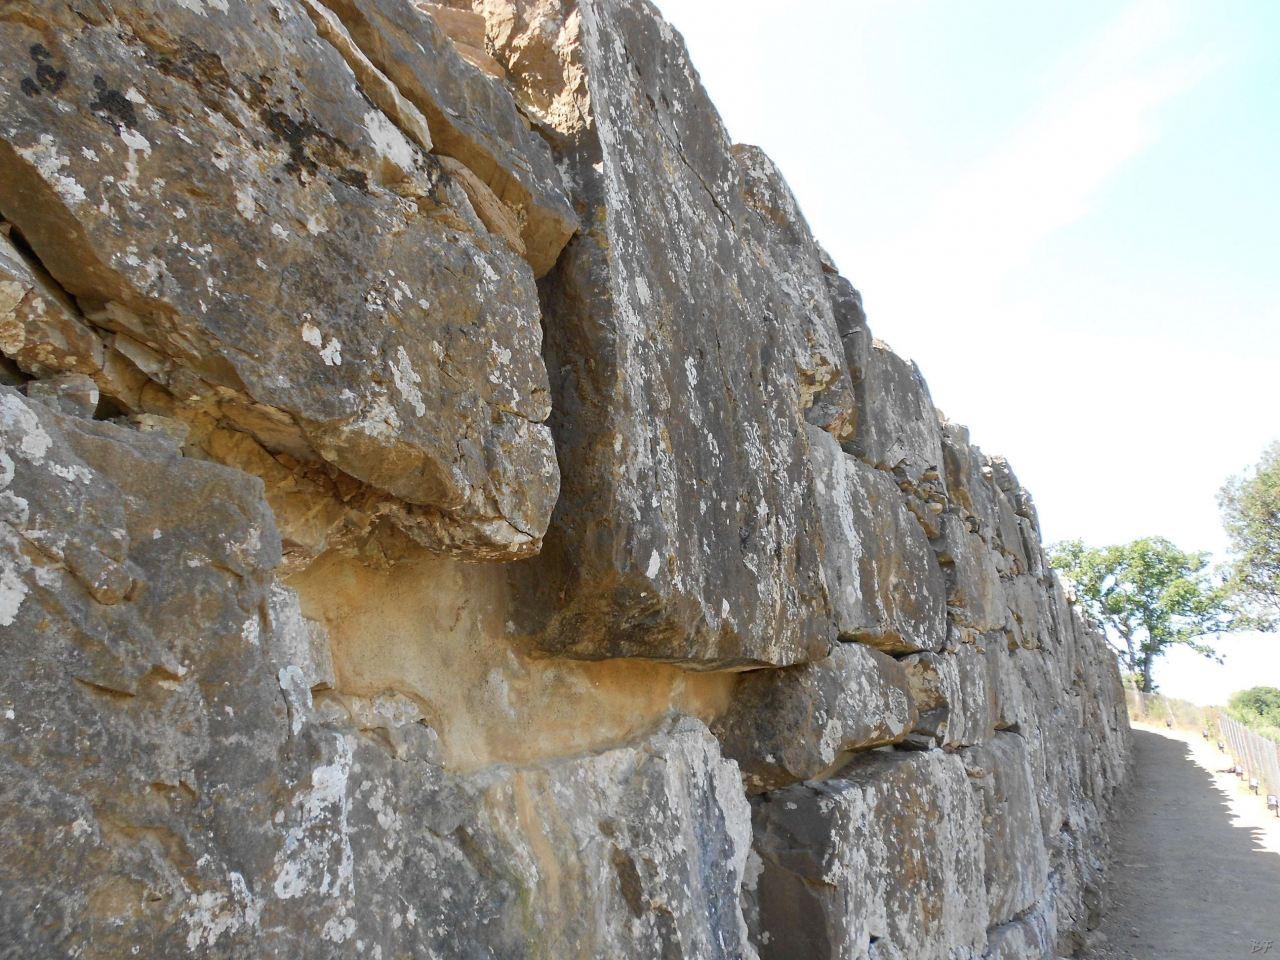 Roselle-Mura-Megalitiche-Roselle-Grosseto-Toscana-Italia-25